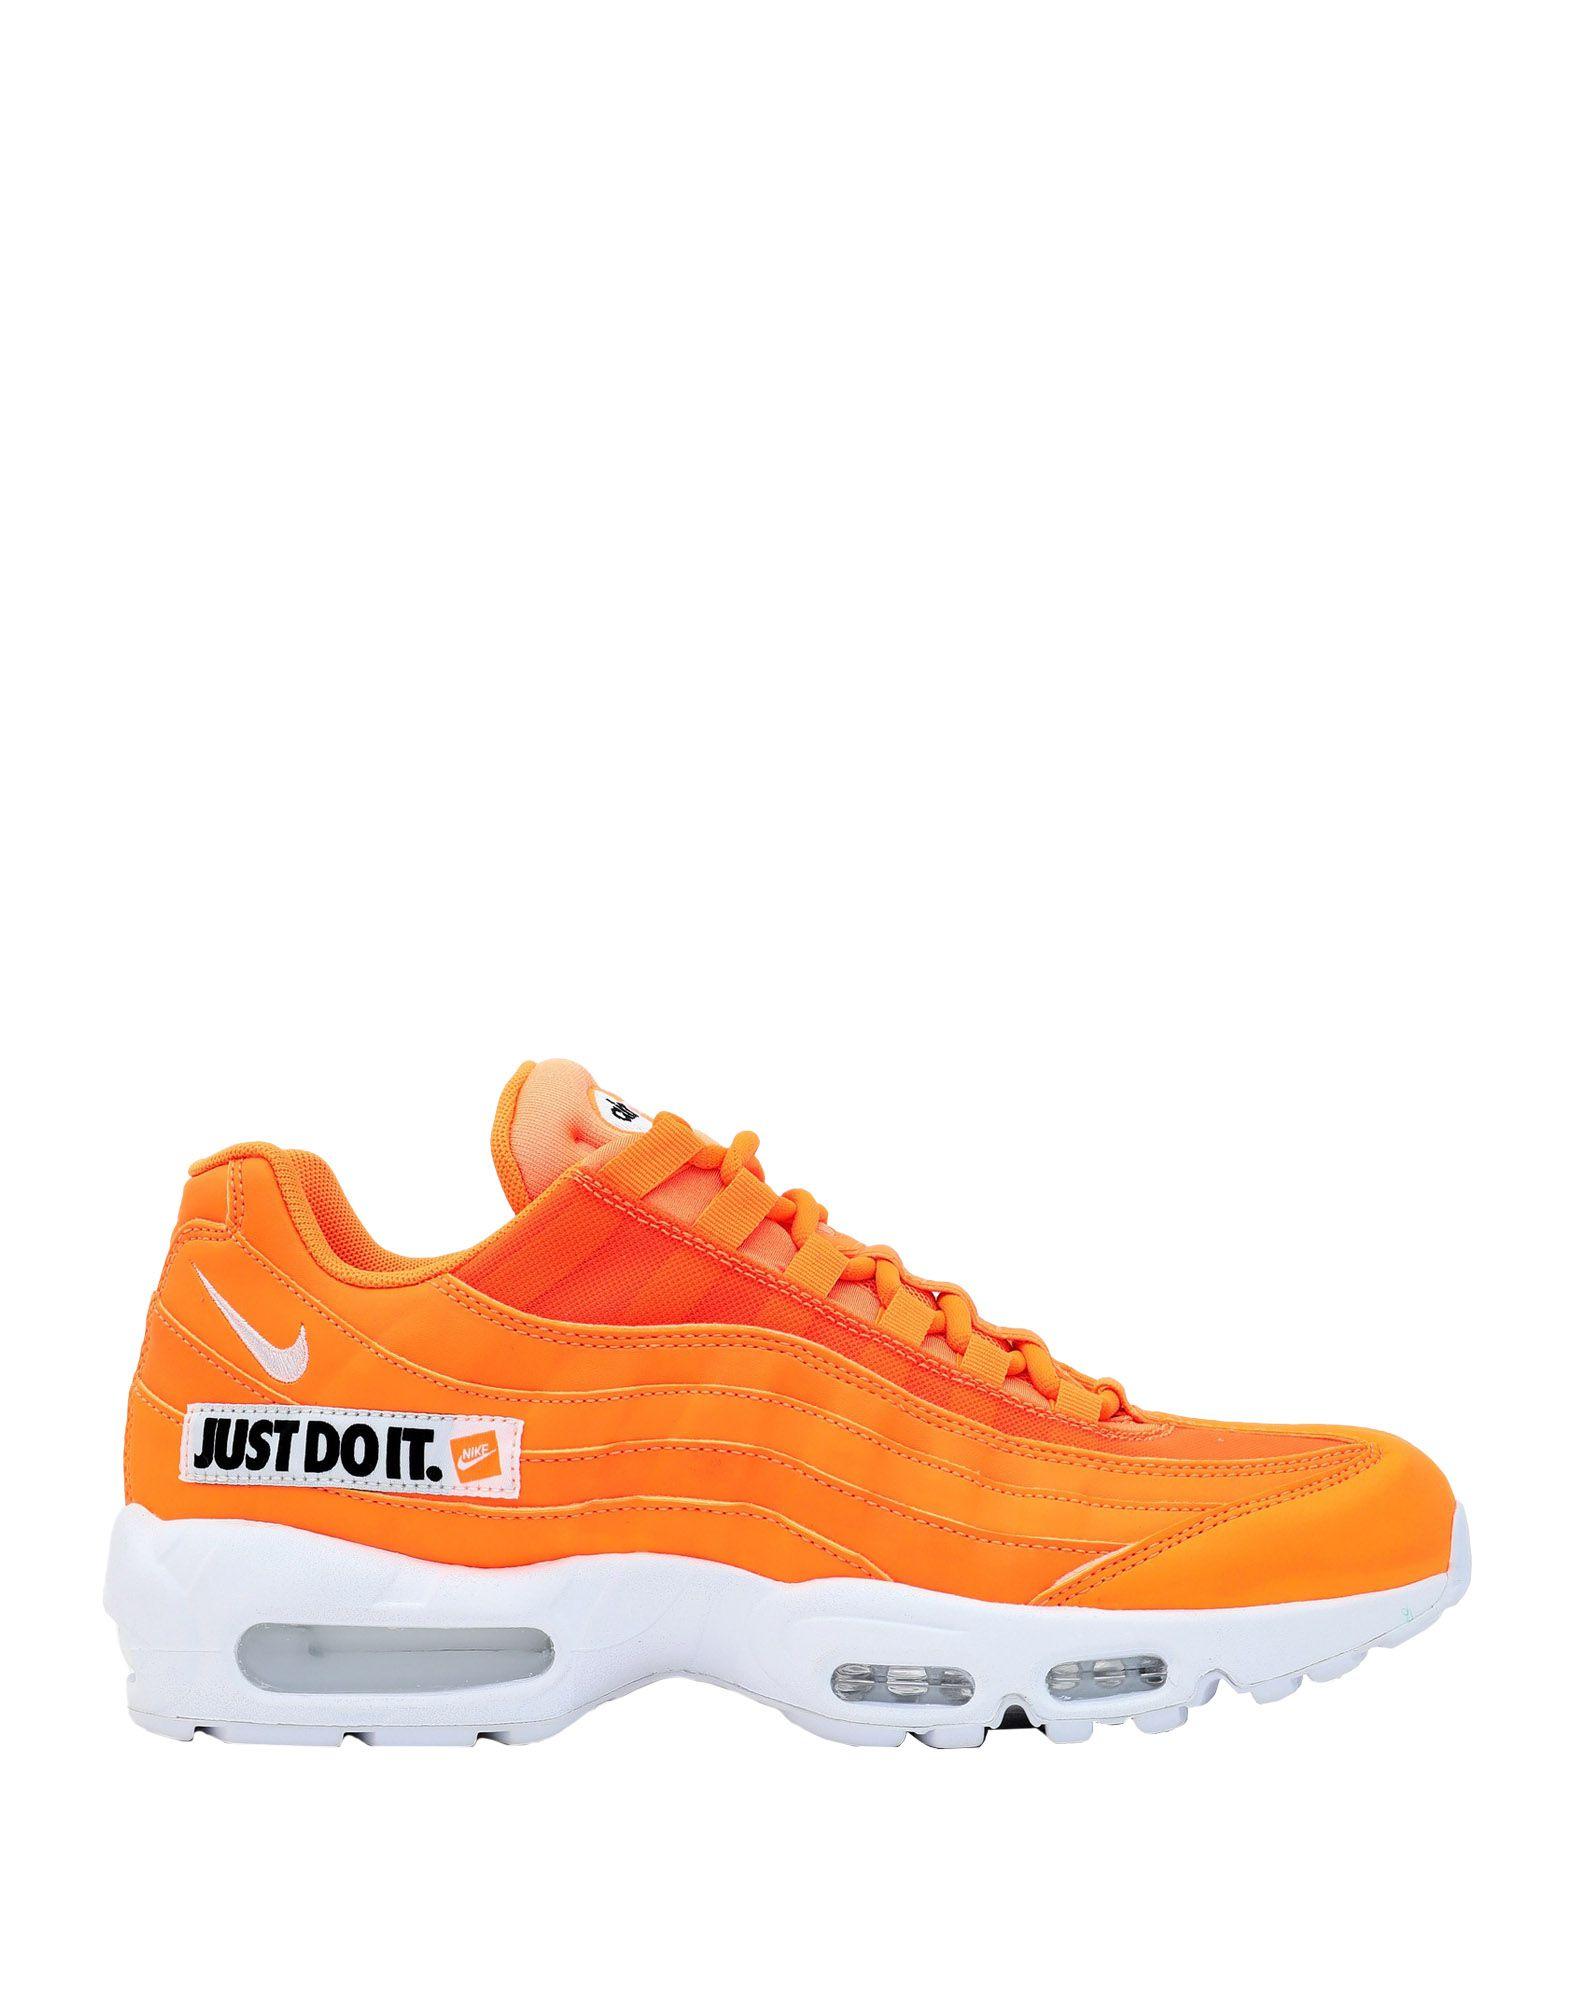 Sneakers Nike Air Max 95 Se - Uomo - 11556702MD